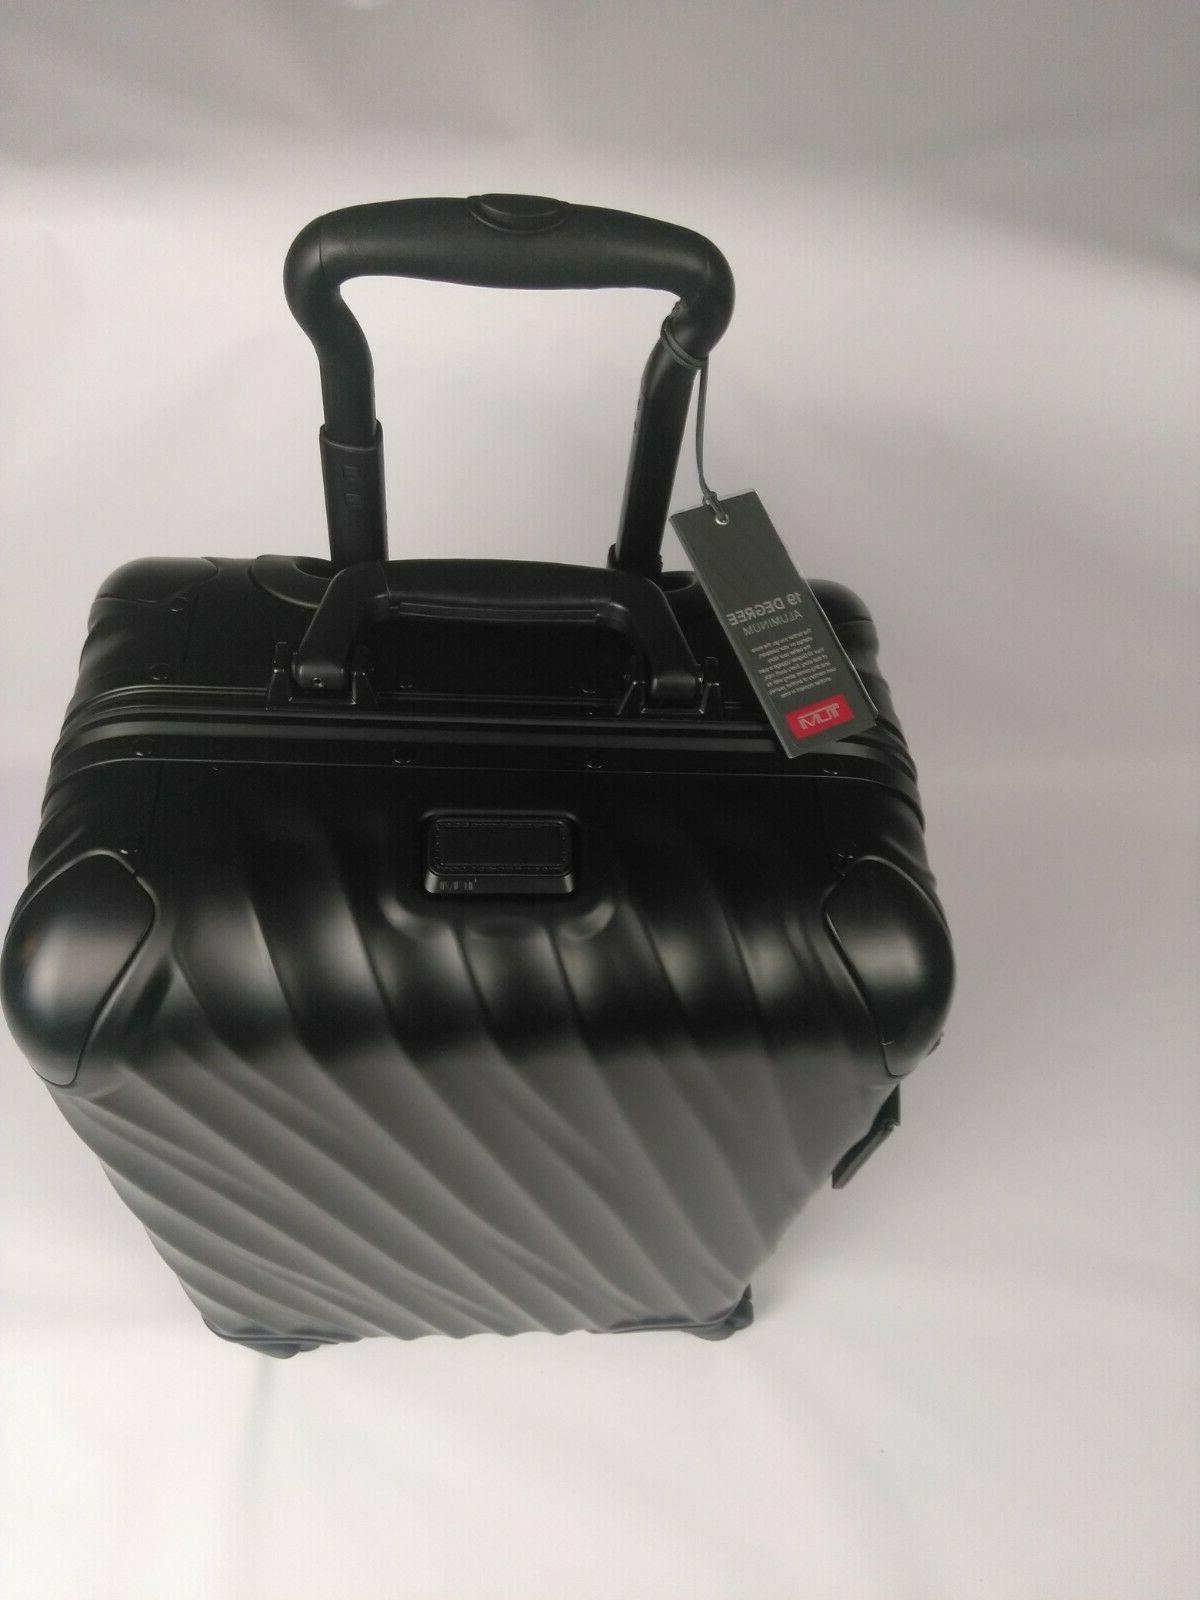 TUMI Degree International Carry-On - NW/OT $995